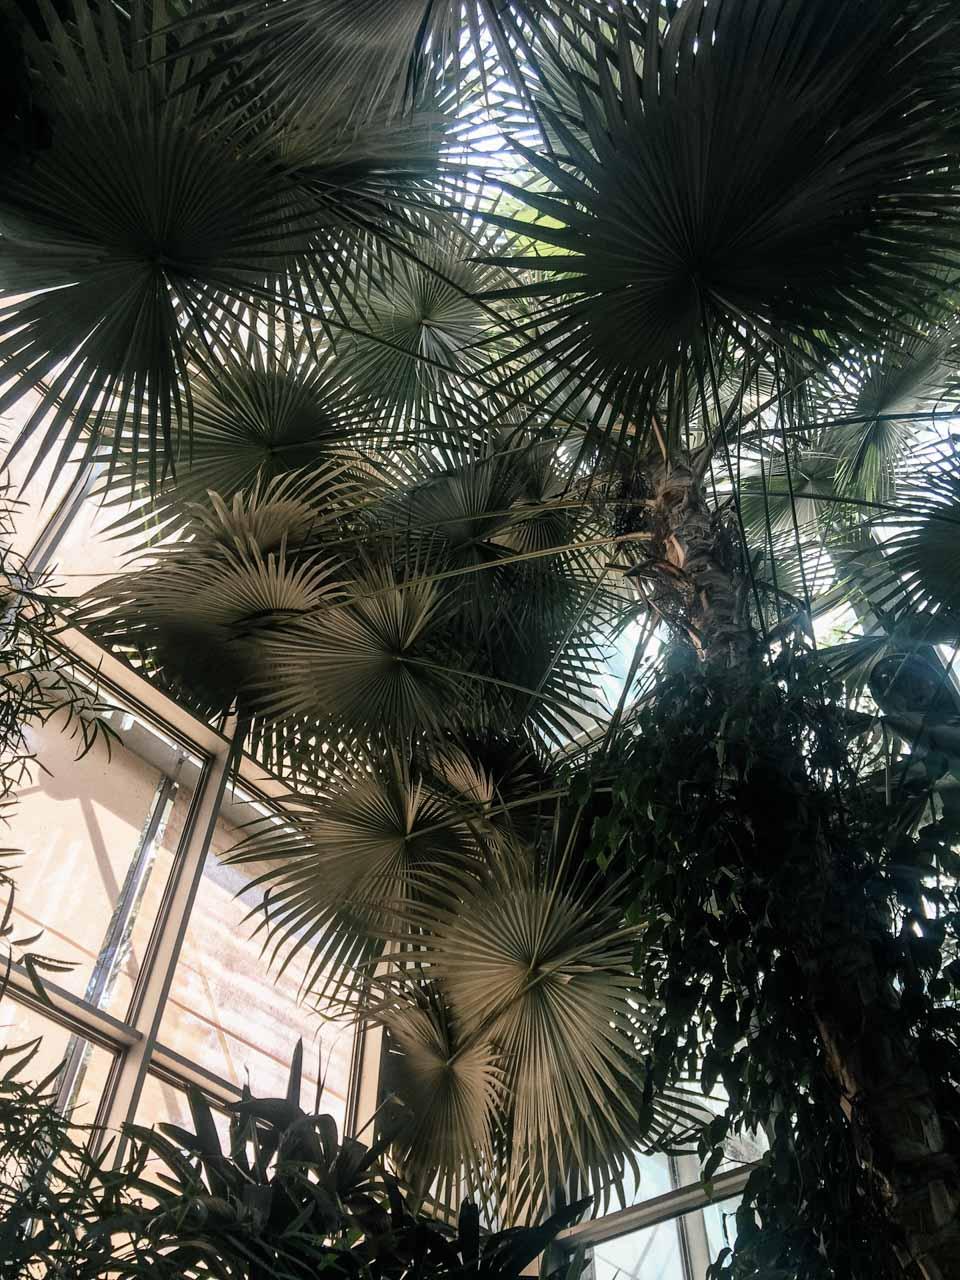 A palm tree in the palm house in Łódź, Poland